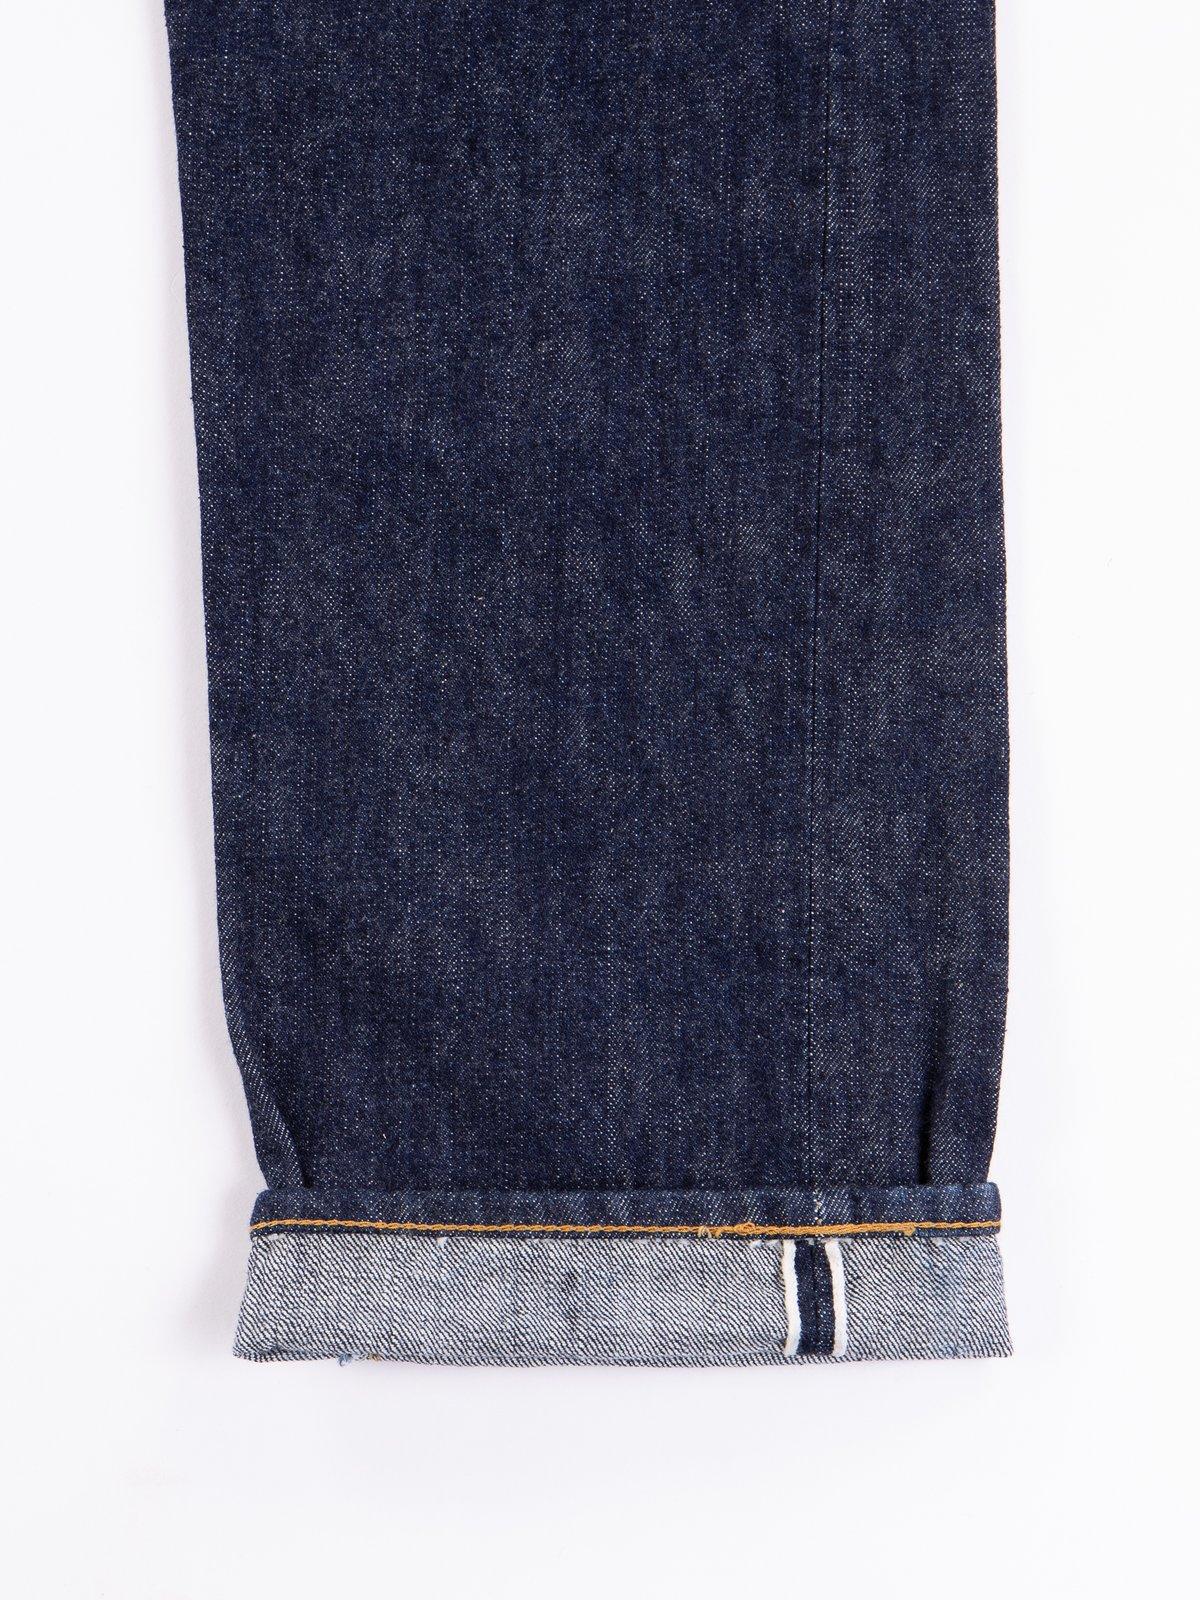 Indigo One Wash 107 Slim Fit Jean - Image 5